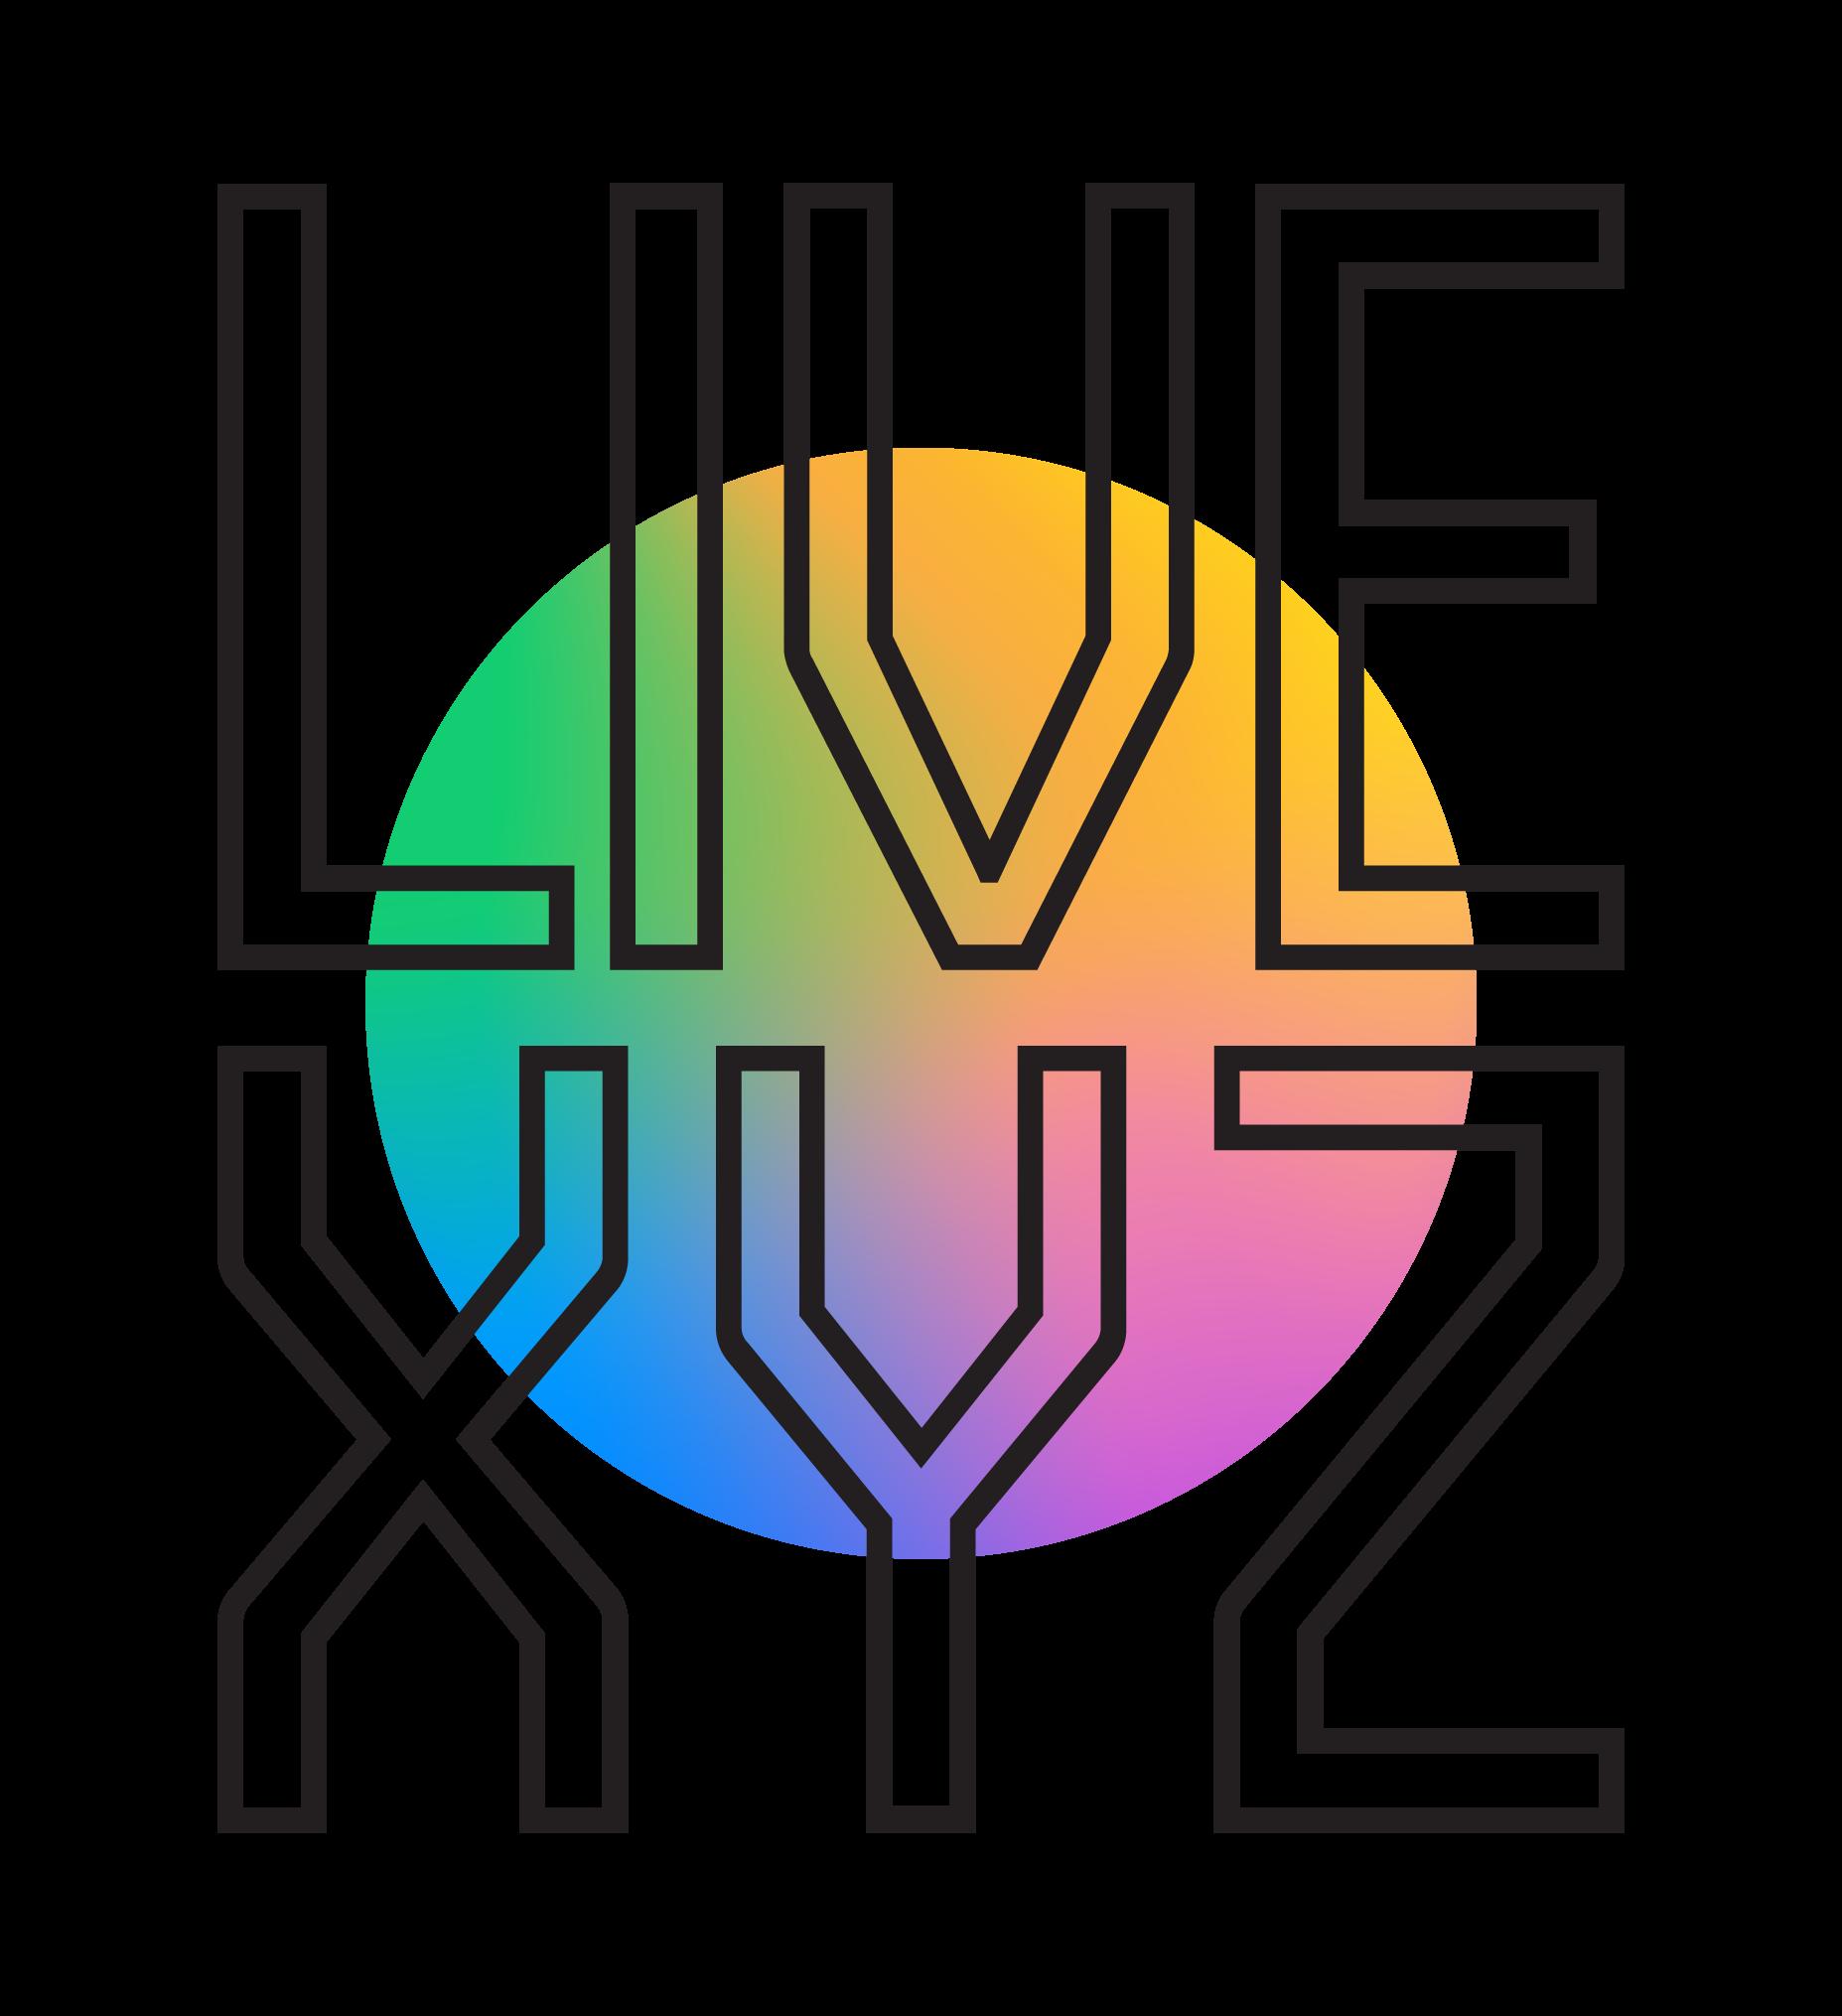 Live XYZ logo